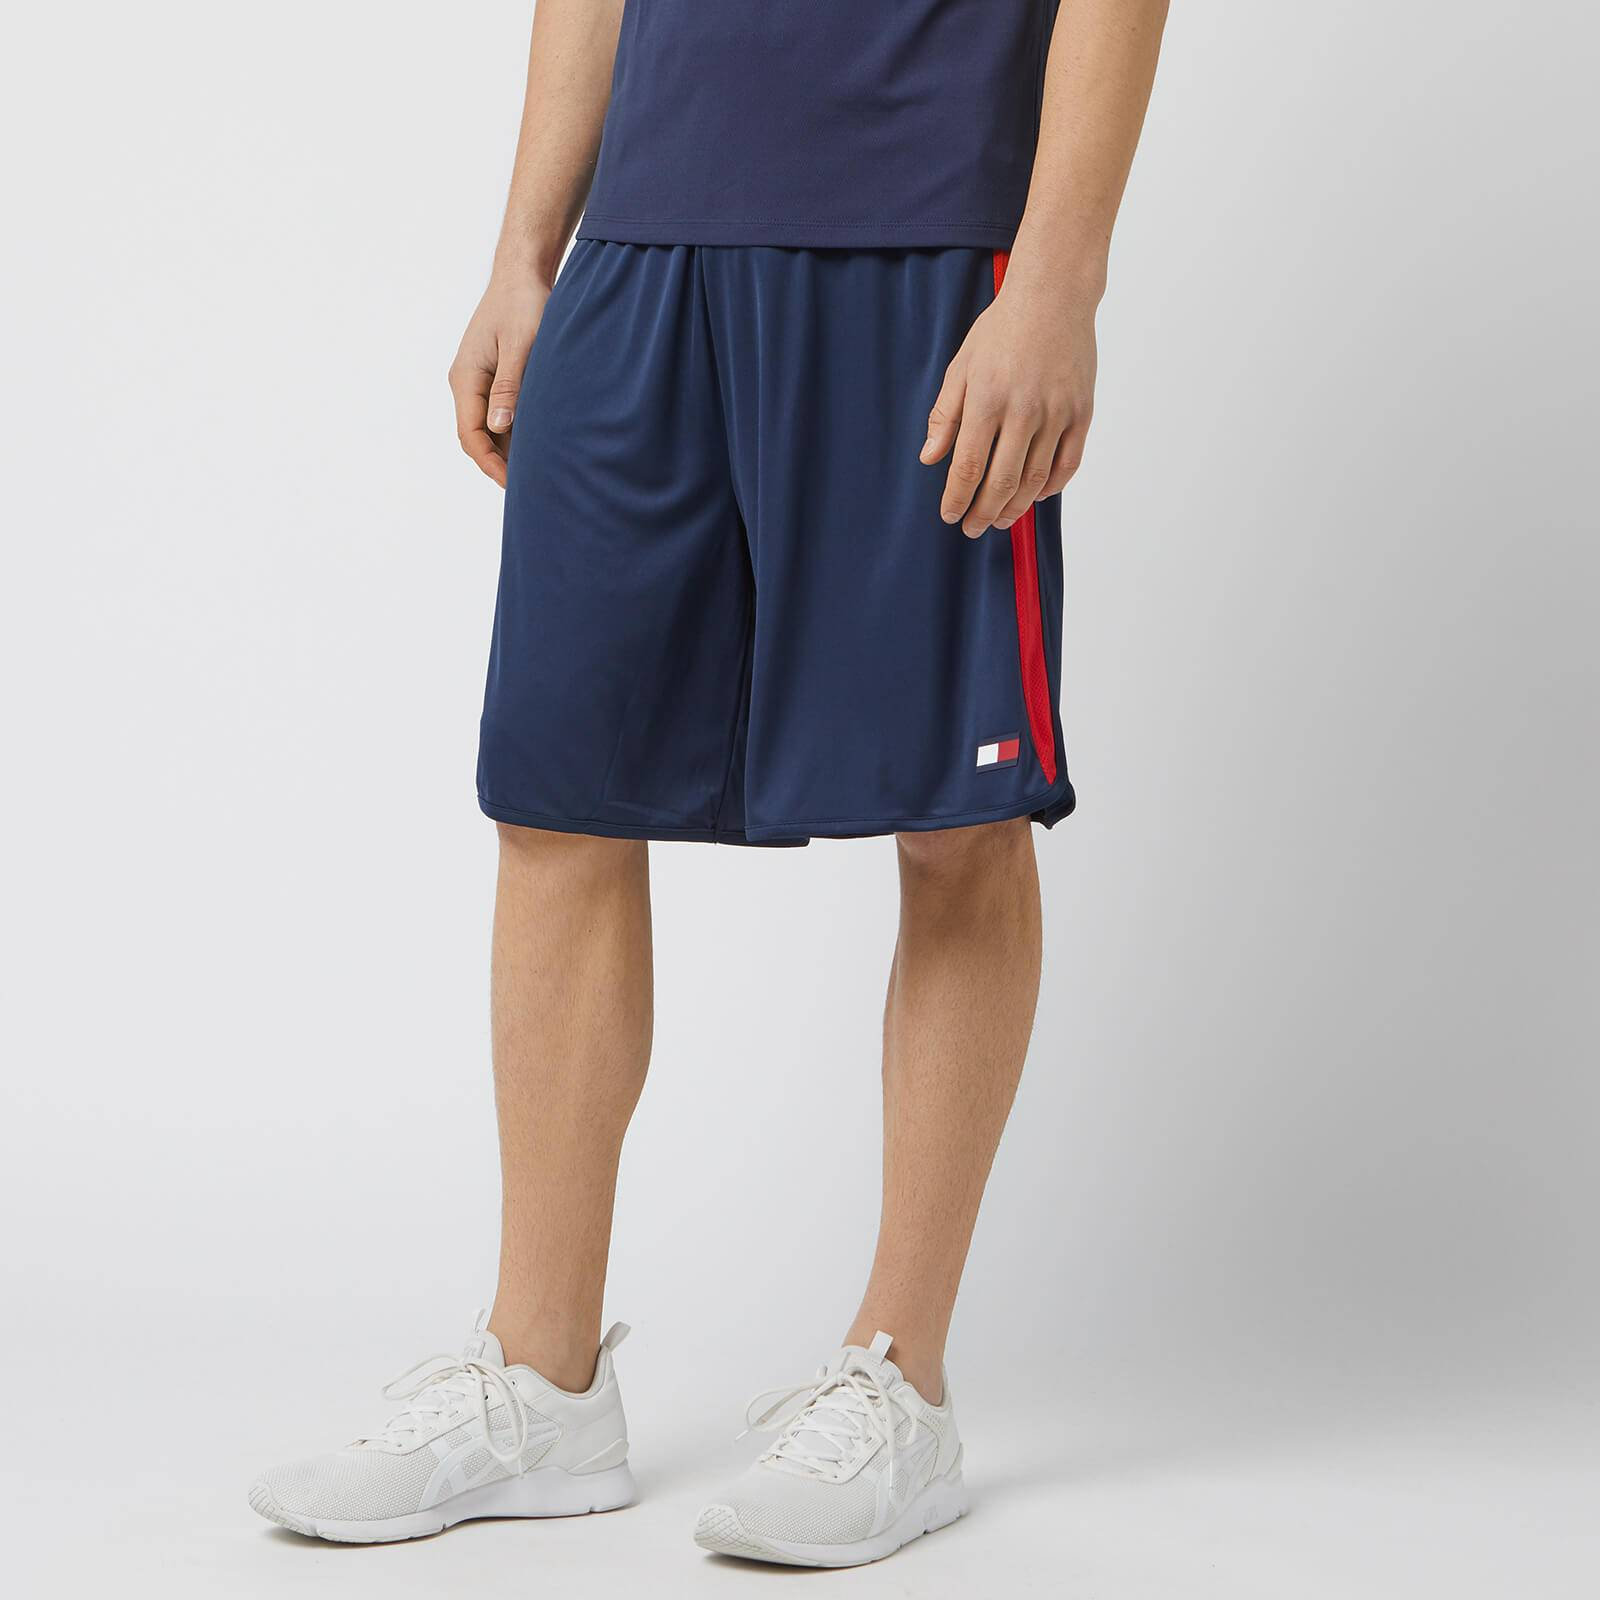 Tommy Hilfiger Sport Men's Shorts With Mesh - Sport Navy - S - Blue